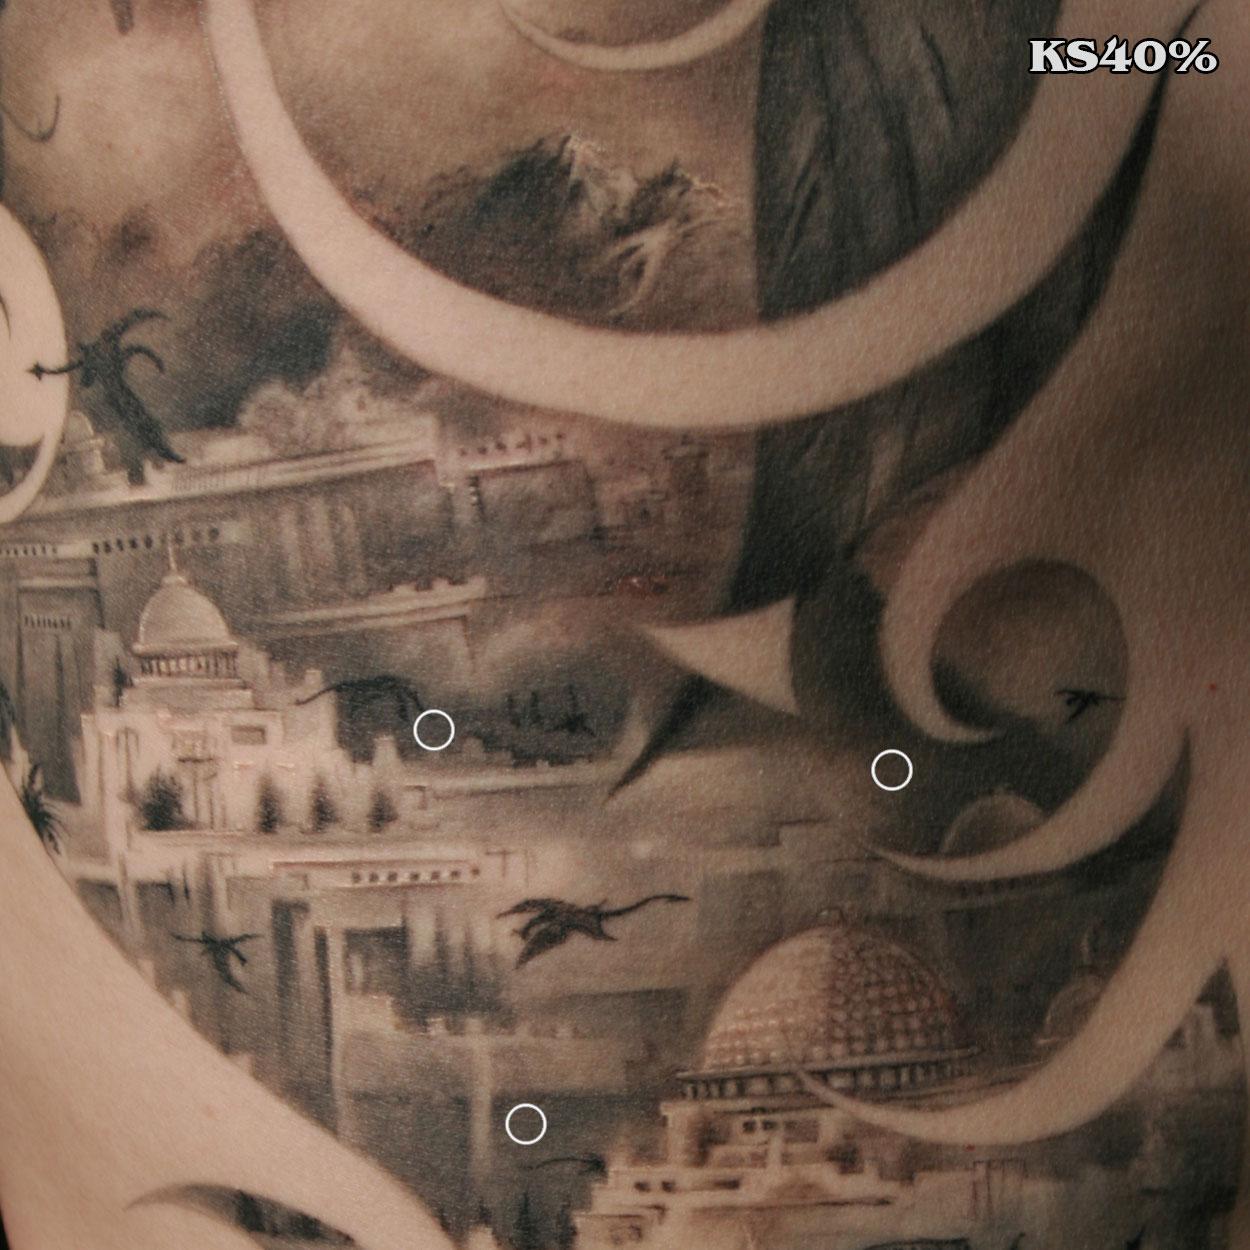 Caesar's land Tattoo-Killer Silver 40%-Gray-Wash-Tattoo Ink-Charcoal Gray